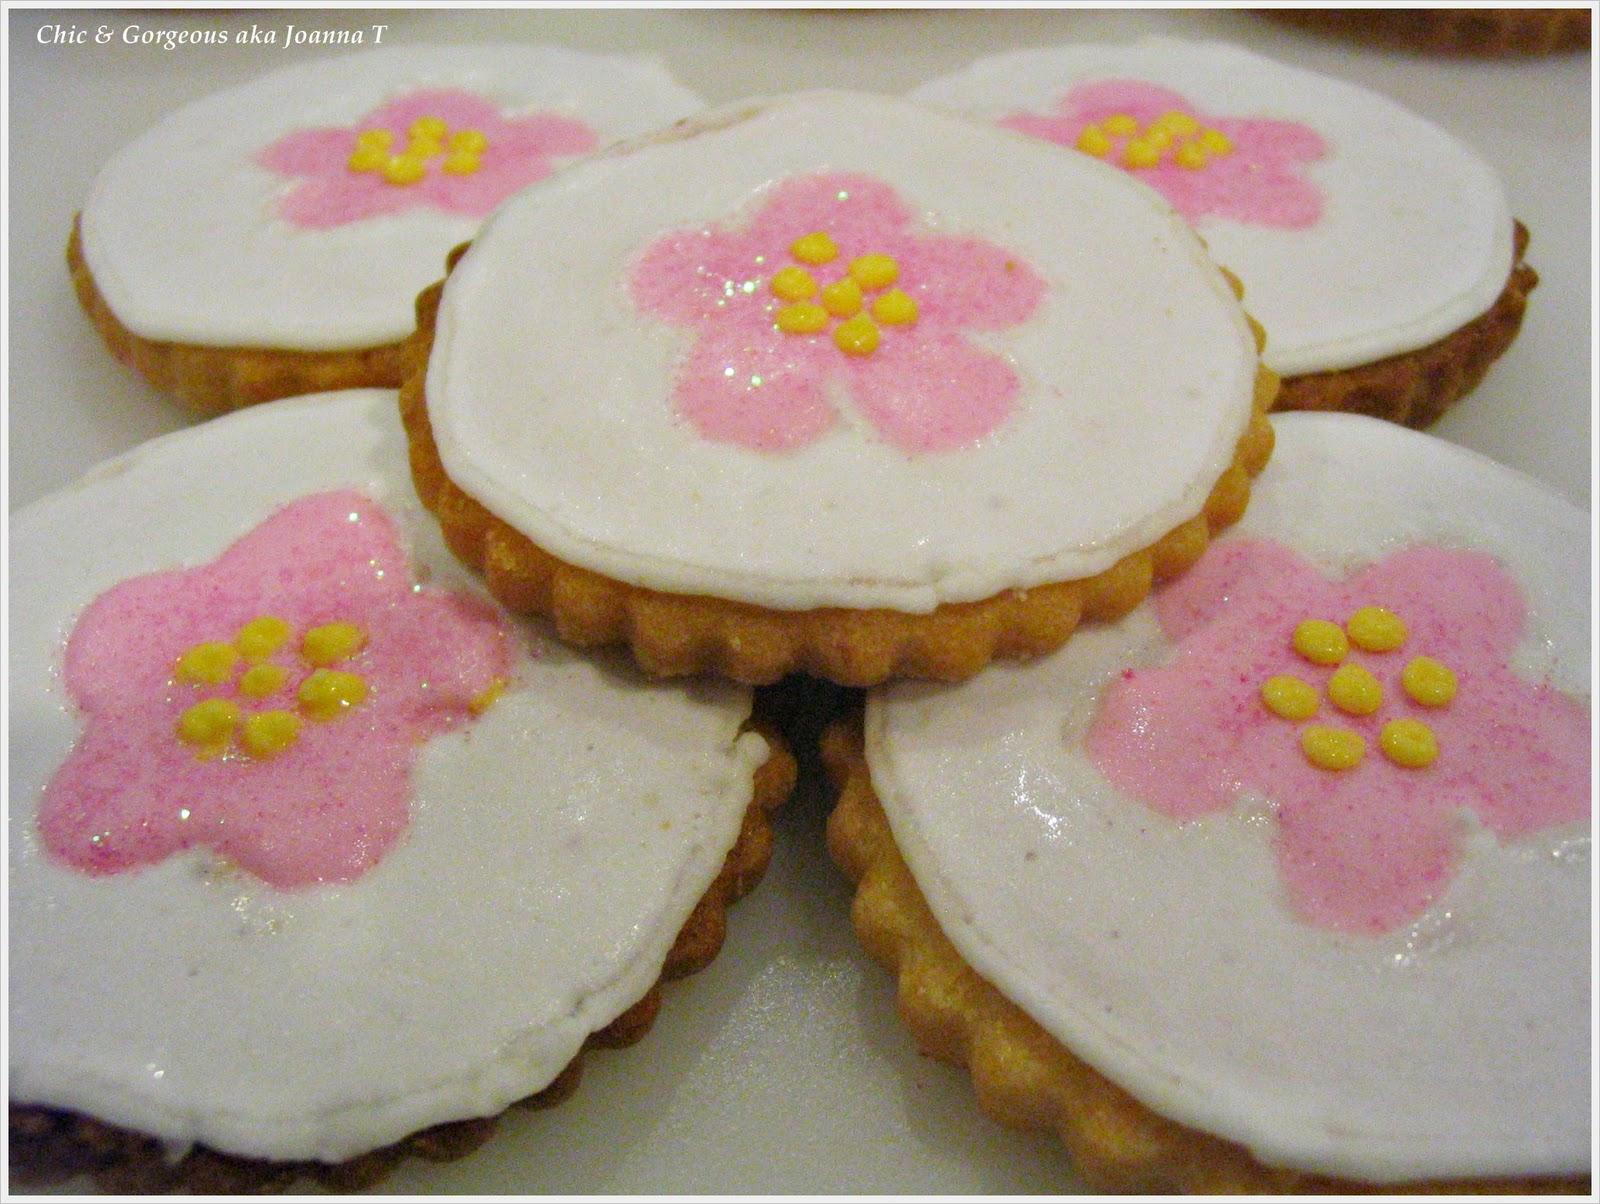 Cherry Cake Recipe Joy Of Baking: Chic & Gorgeous Treats: Baking Recipe: Cherry Blossom Cake